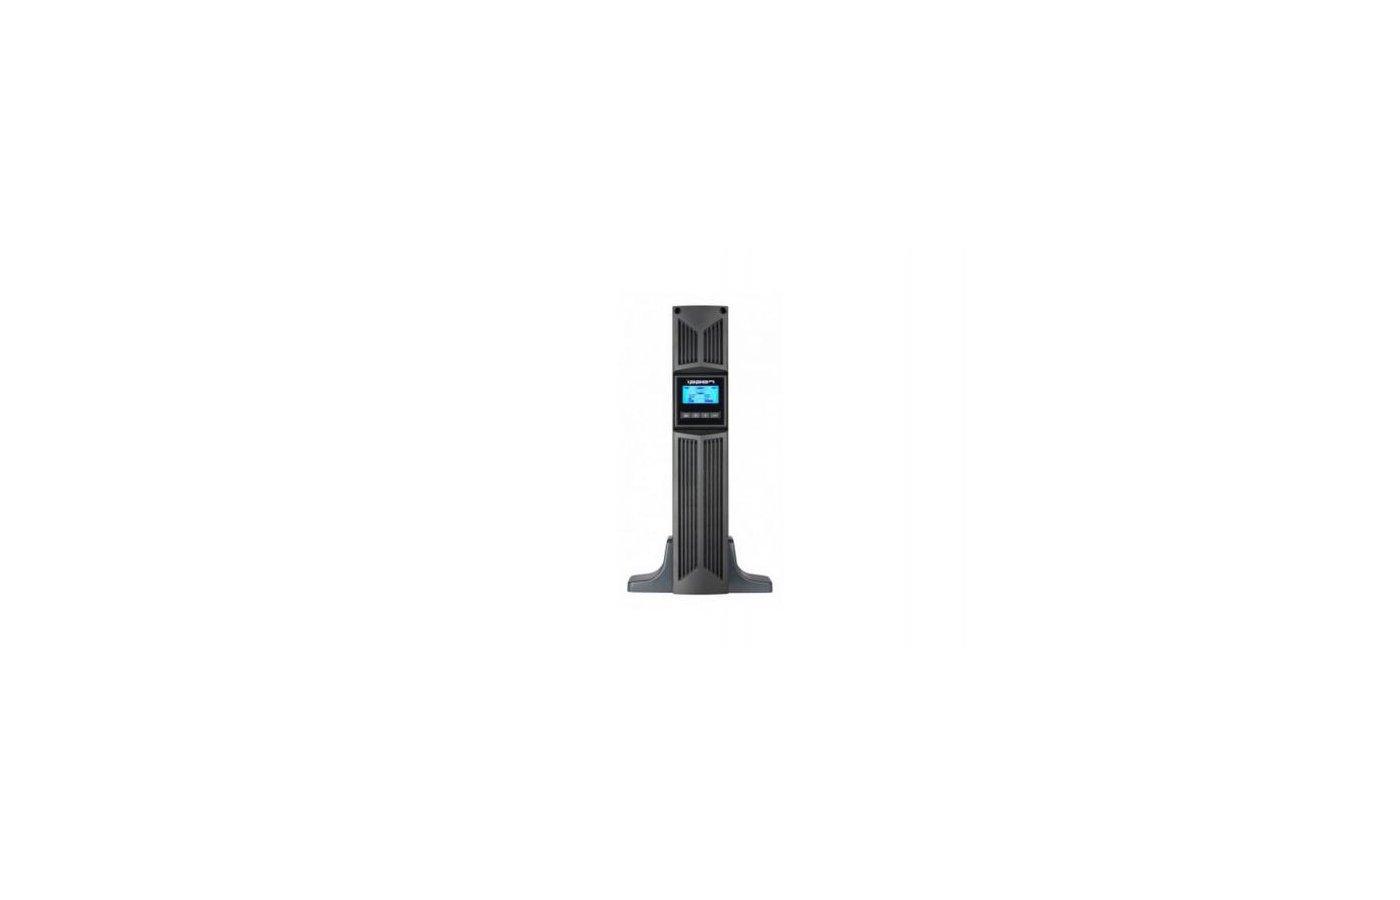 Блок питания Ippon Innova RT 1000 1000VA/900W RS-232,USB, Rackmount/Tower (8 x IEC)